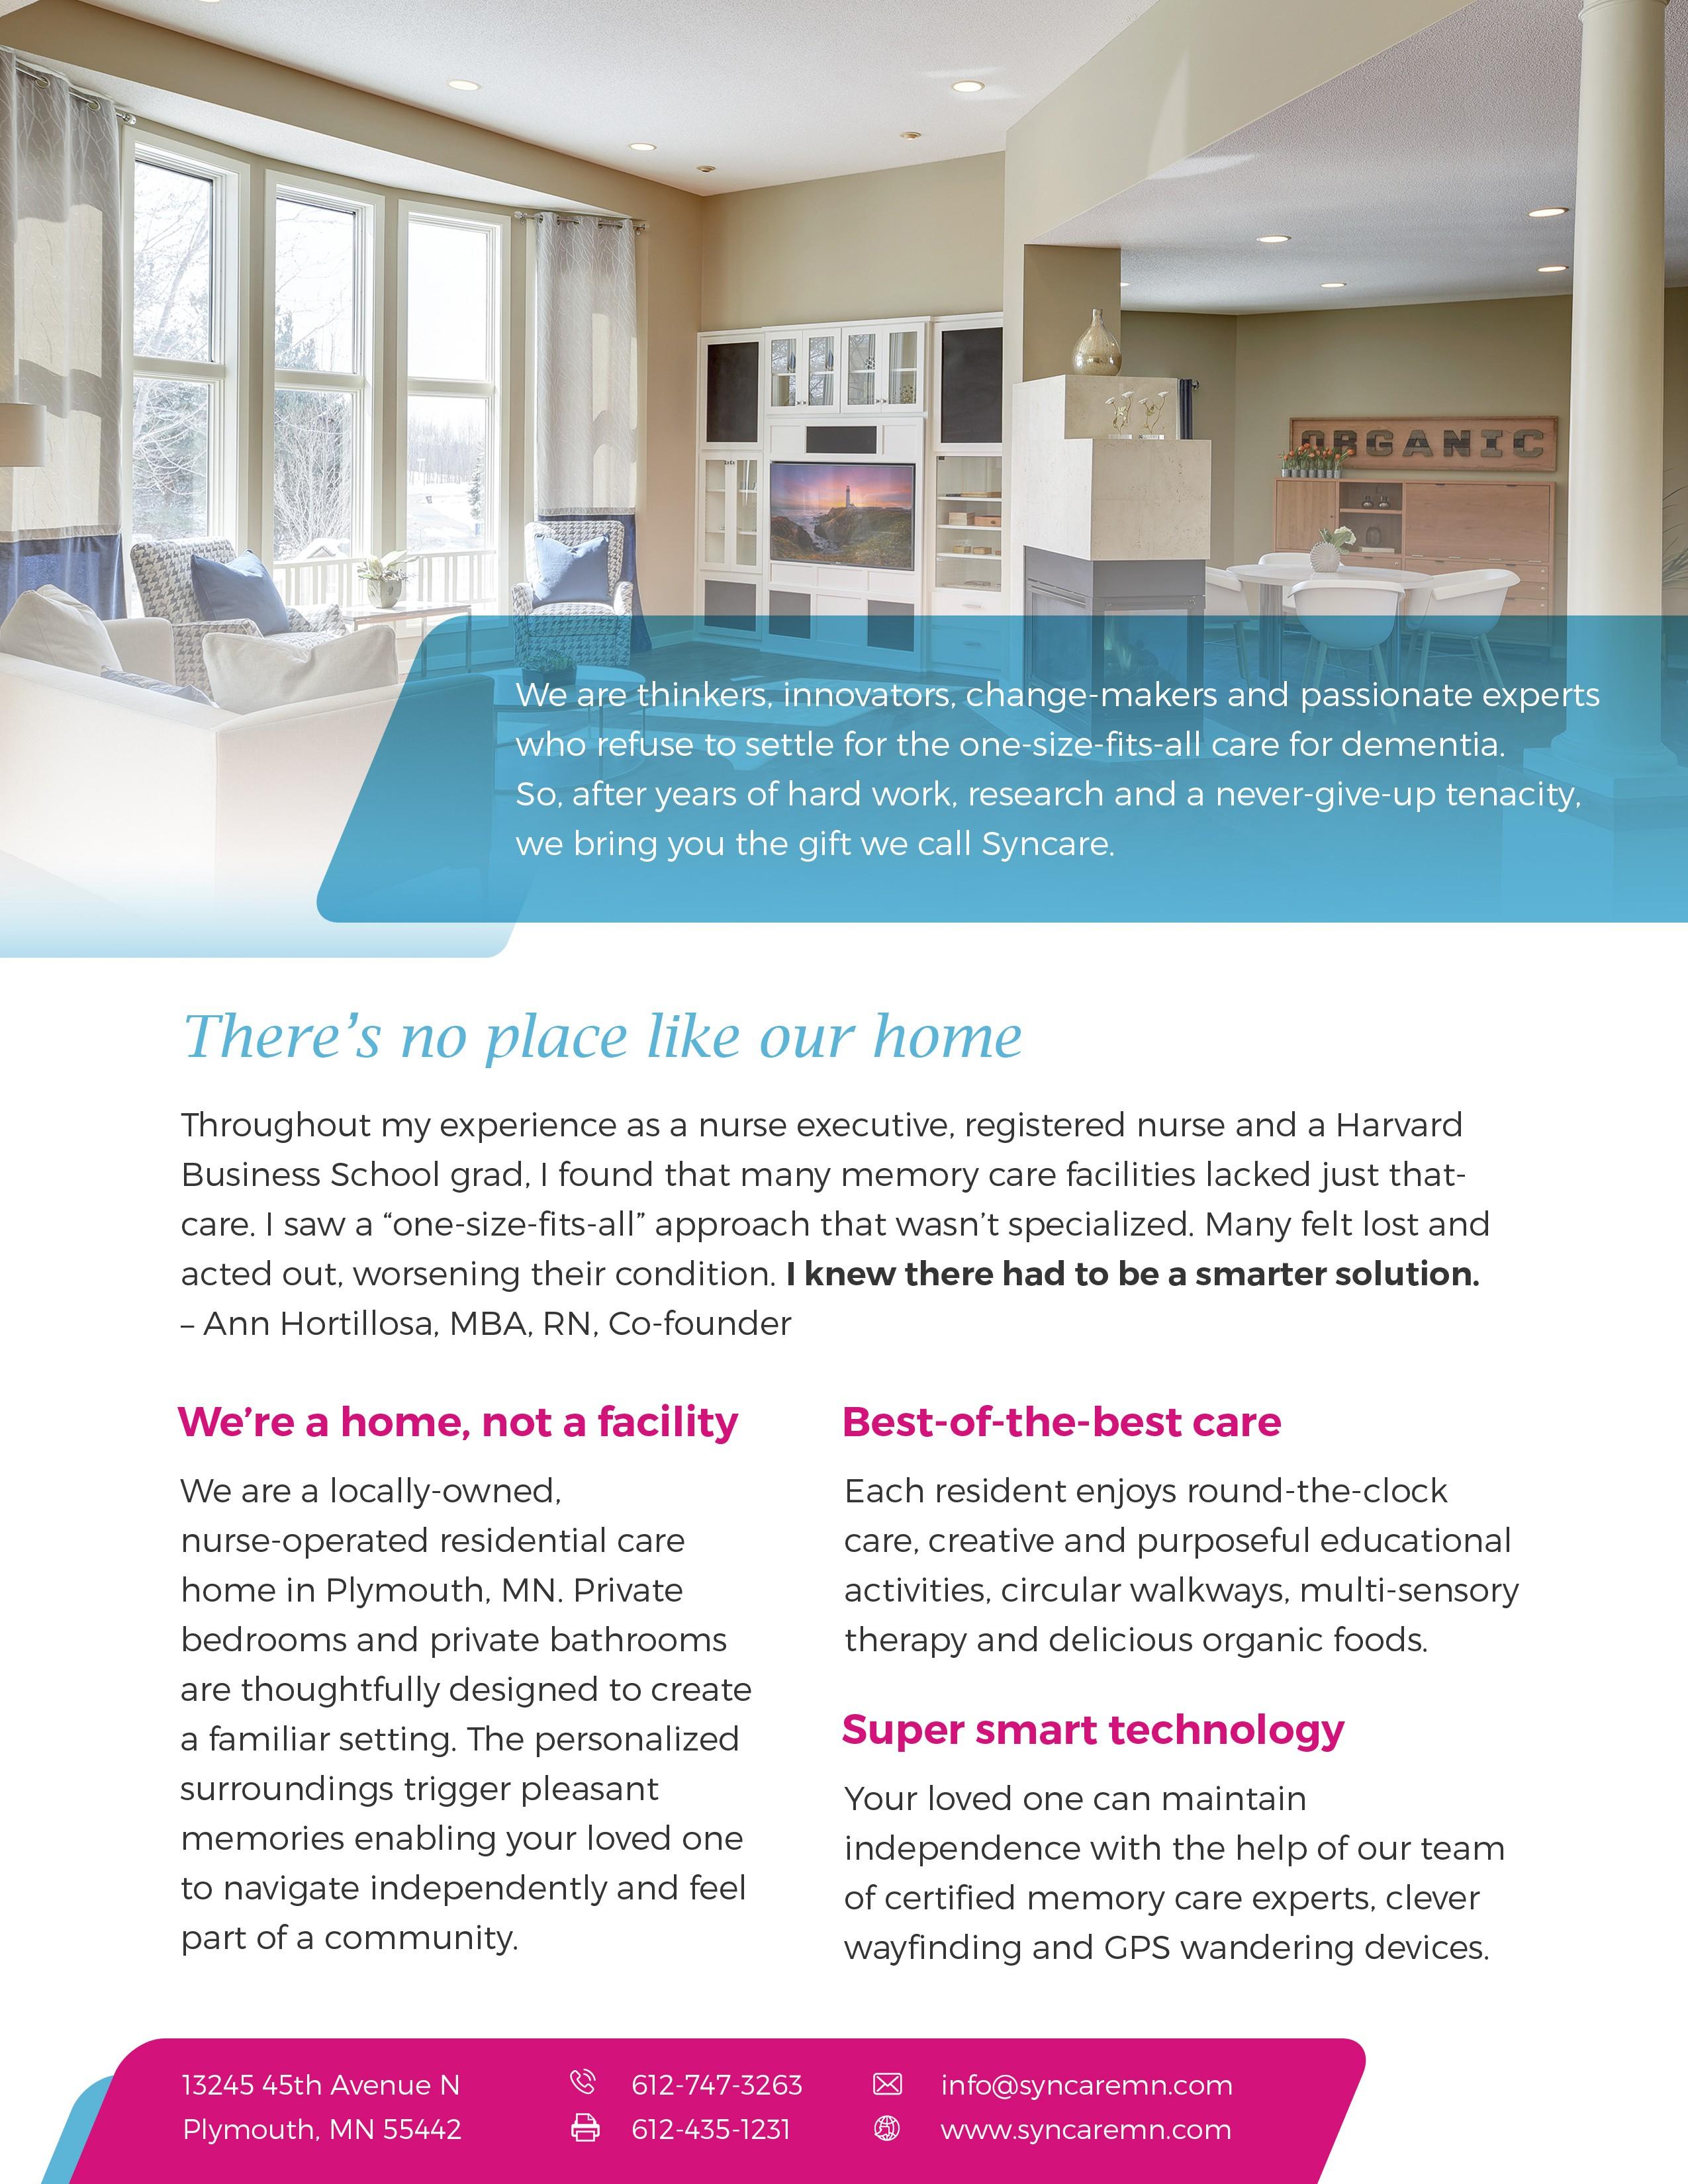 New company brochure